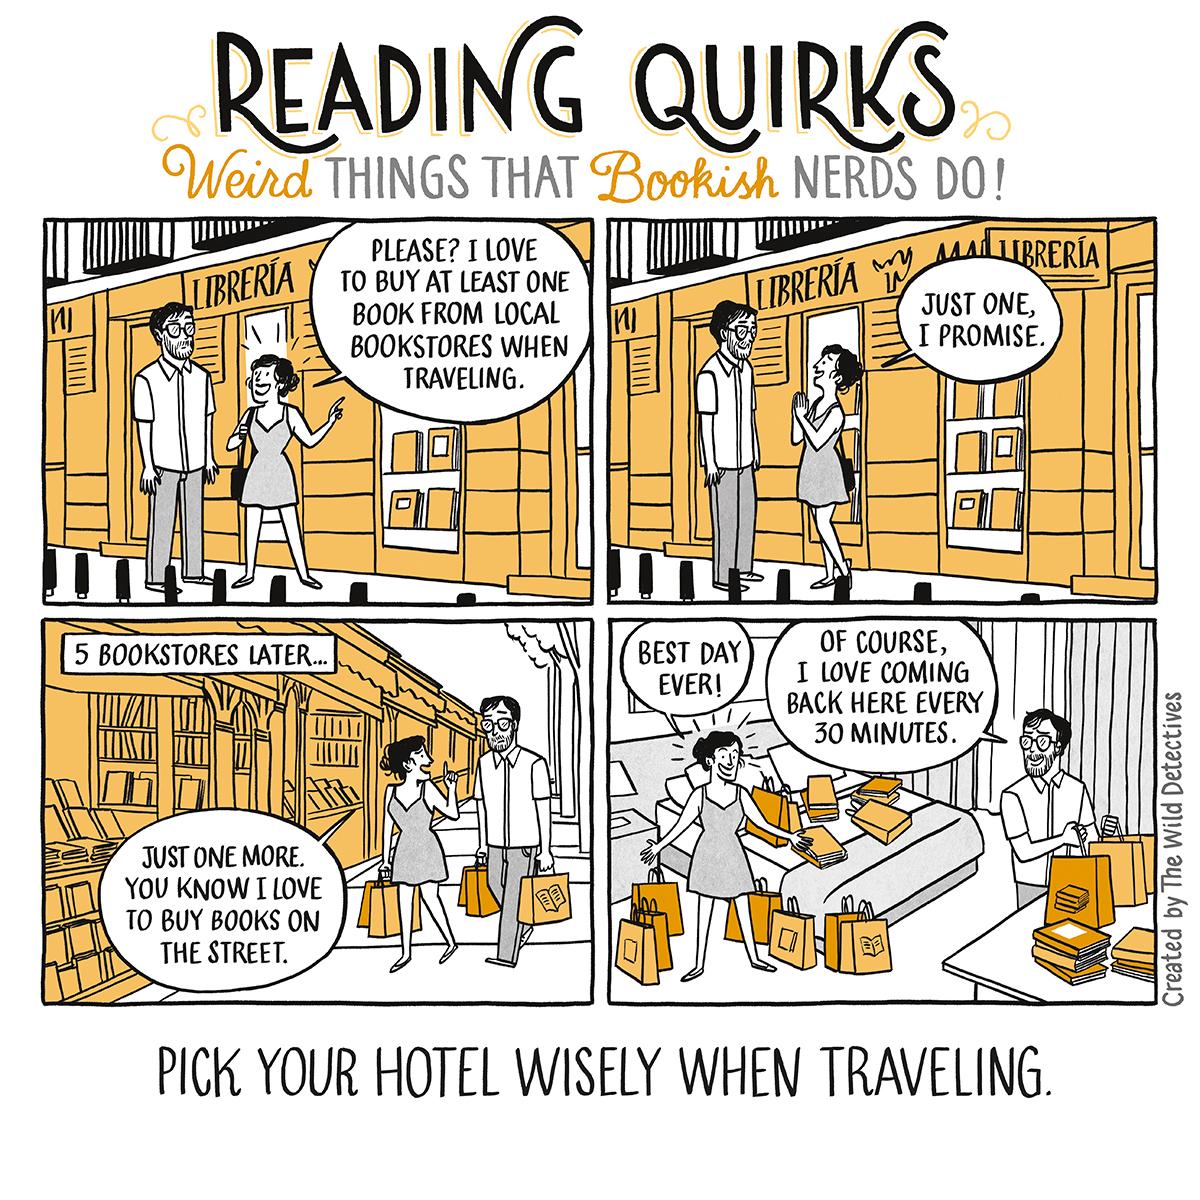 readingquirks9